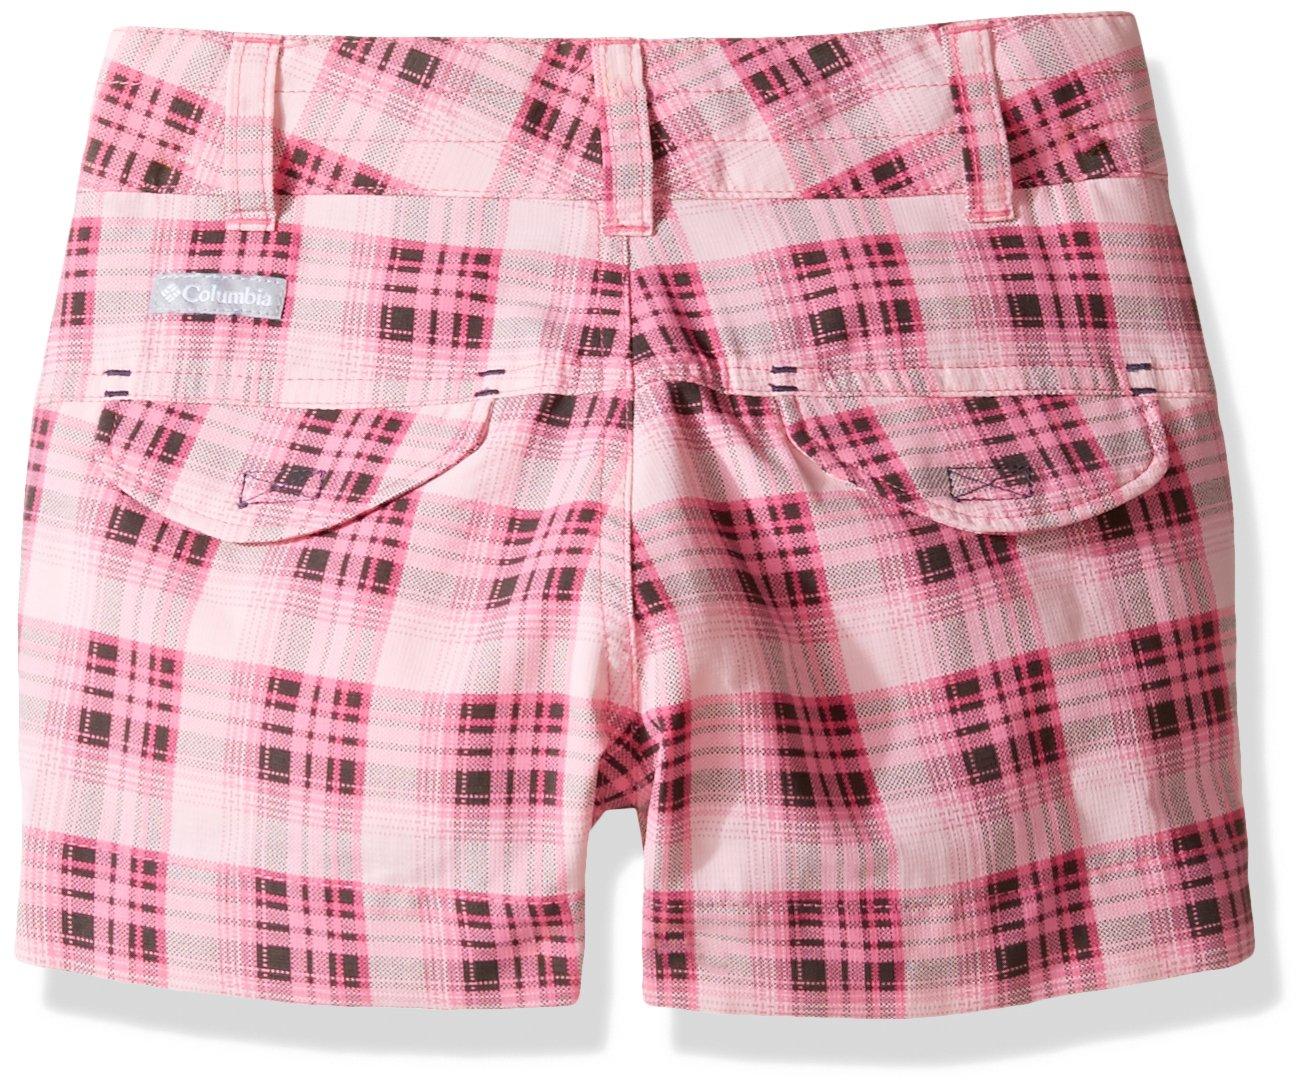 Columbia Girls Silver Ridge Printed Shorts Columbia Sporting Goods 1715271643-XXS